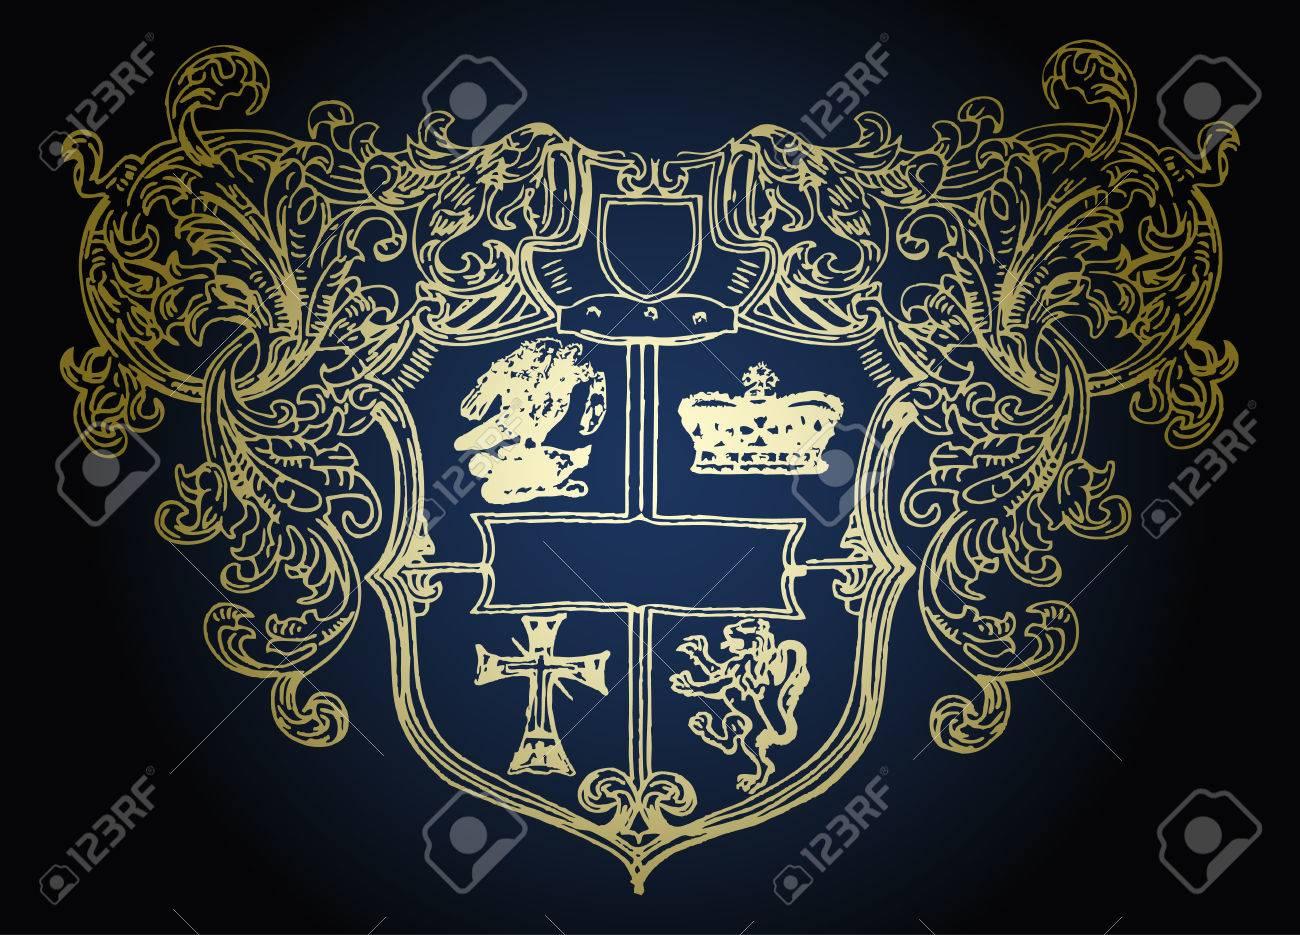 military shield emblem design Stock Vector - 5638863